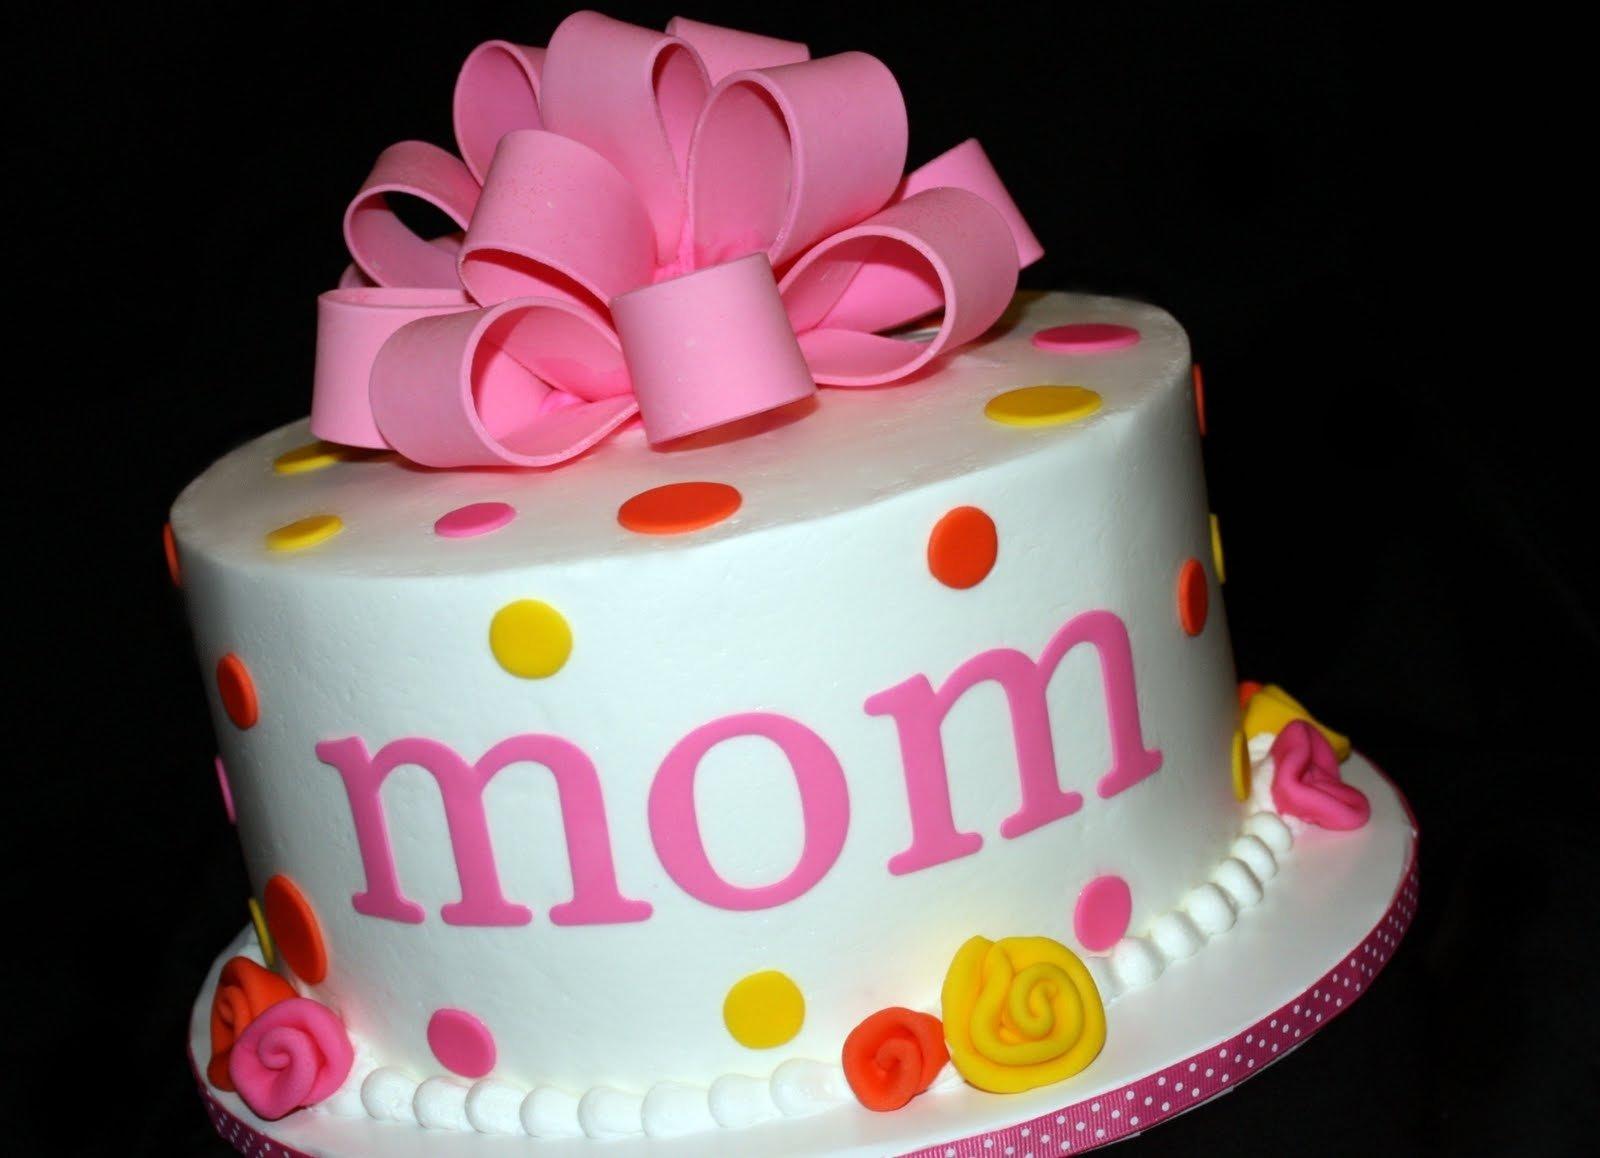 10 Fashionable Birthday Cake Ideas For Mom fun cakes mom birthday cake fun cakes pinterest mom birthday 2020